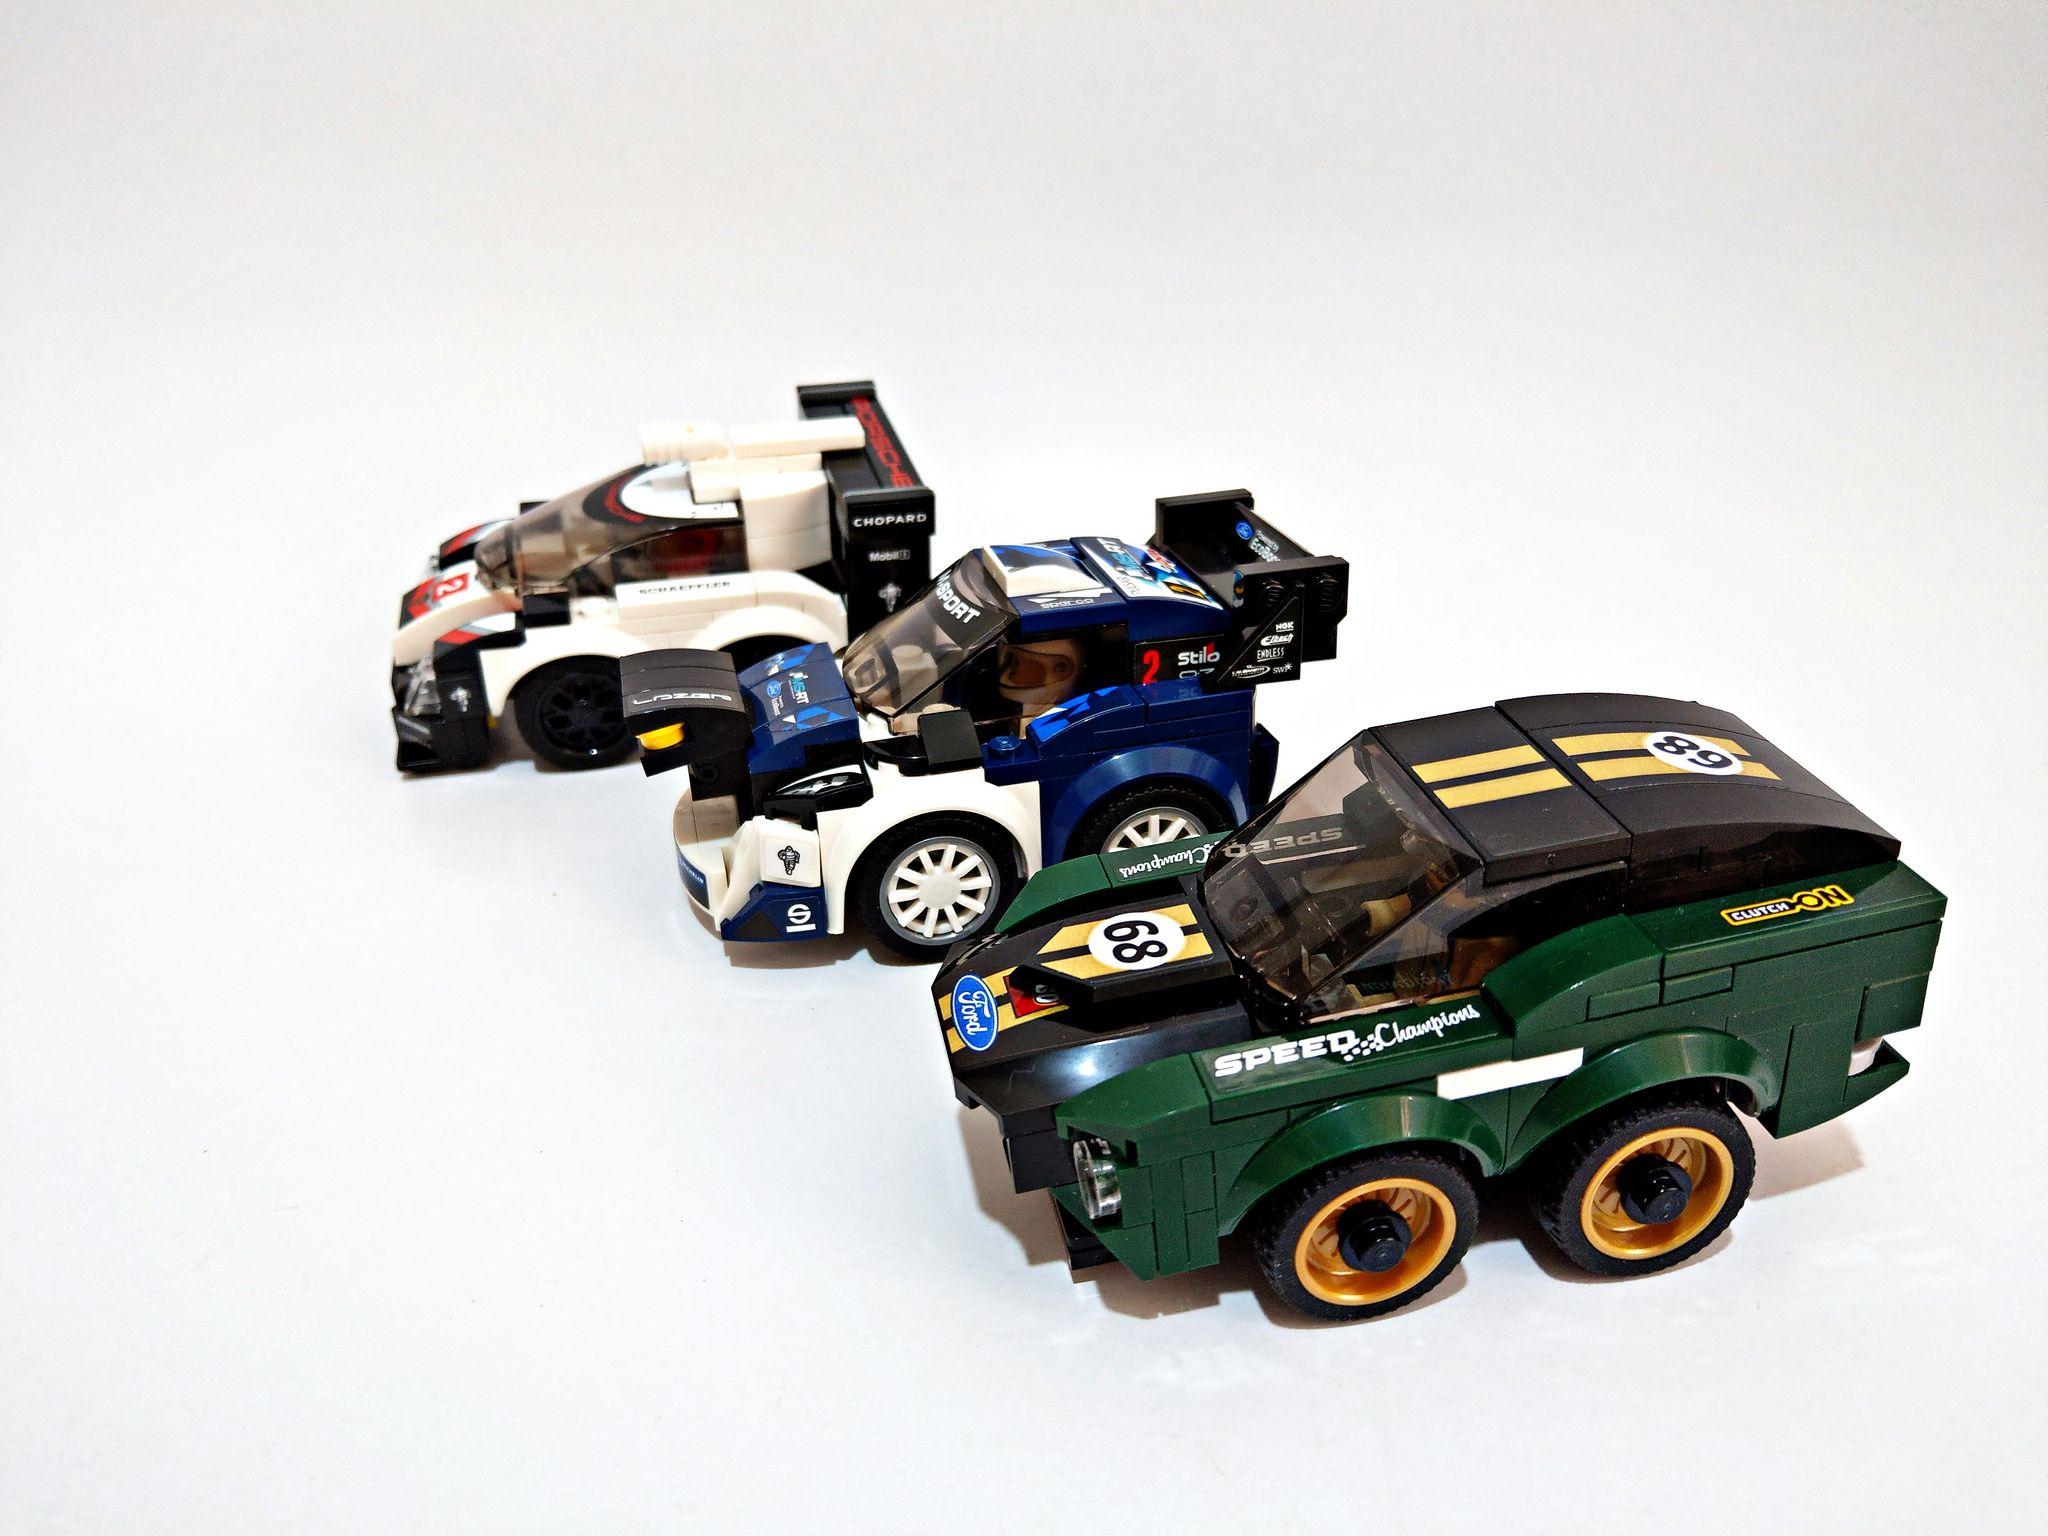 Lego 75884 Speed Champions alternative build | by c_s417